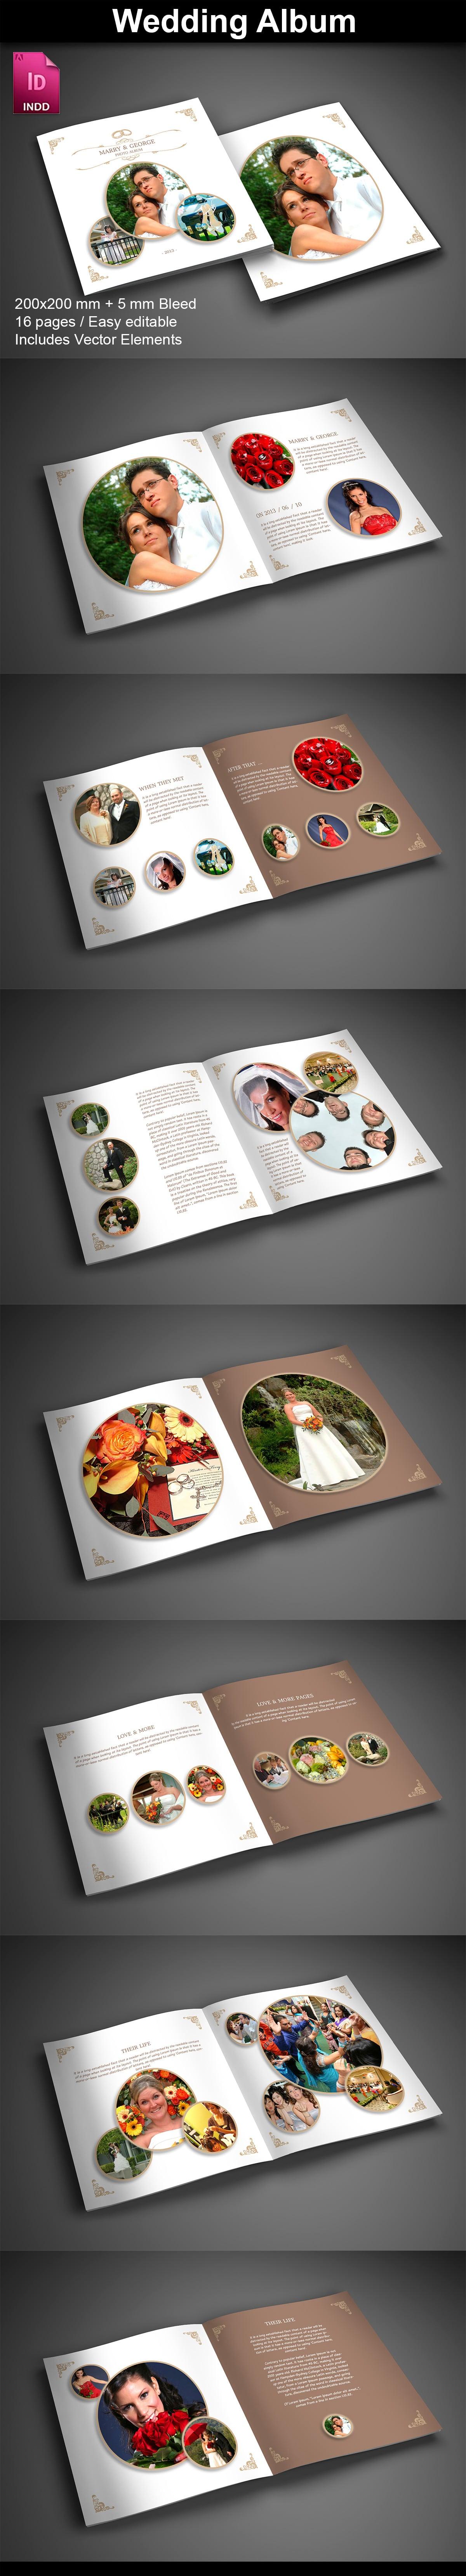 15  InDesign Product Catalogs - just $19 - 10 WeddingAlbum ImagePreview